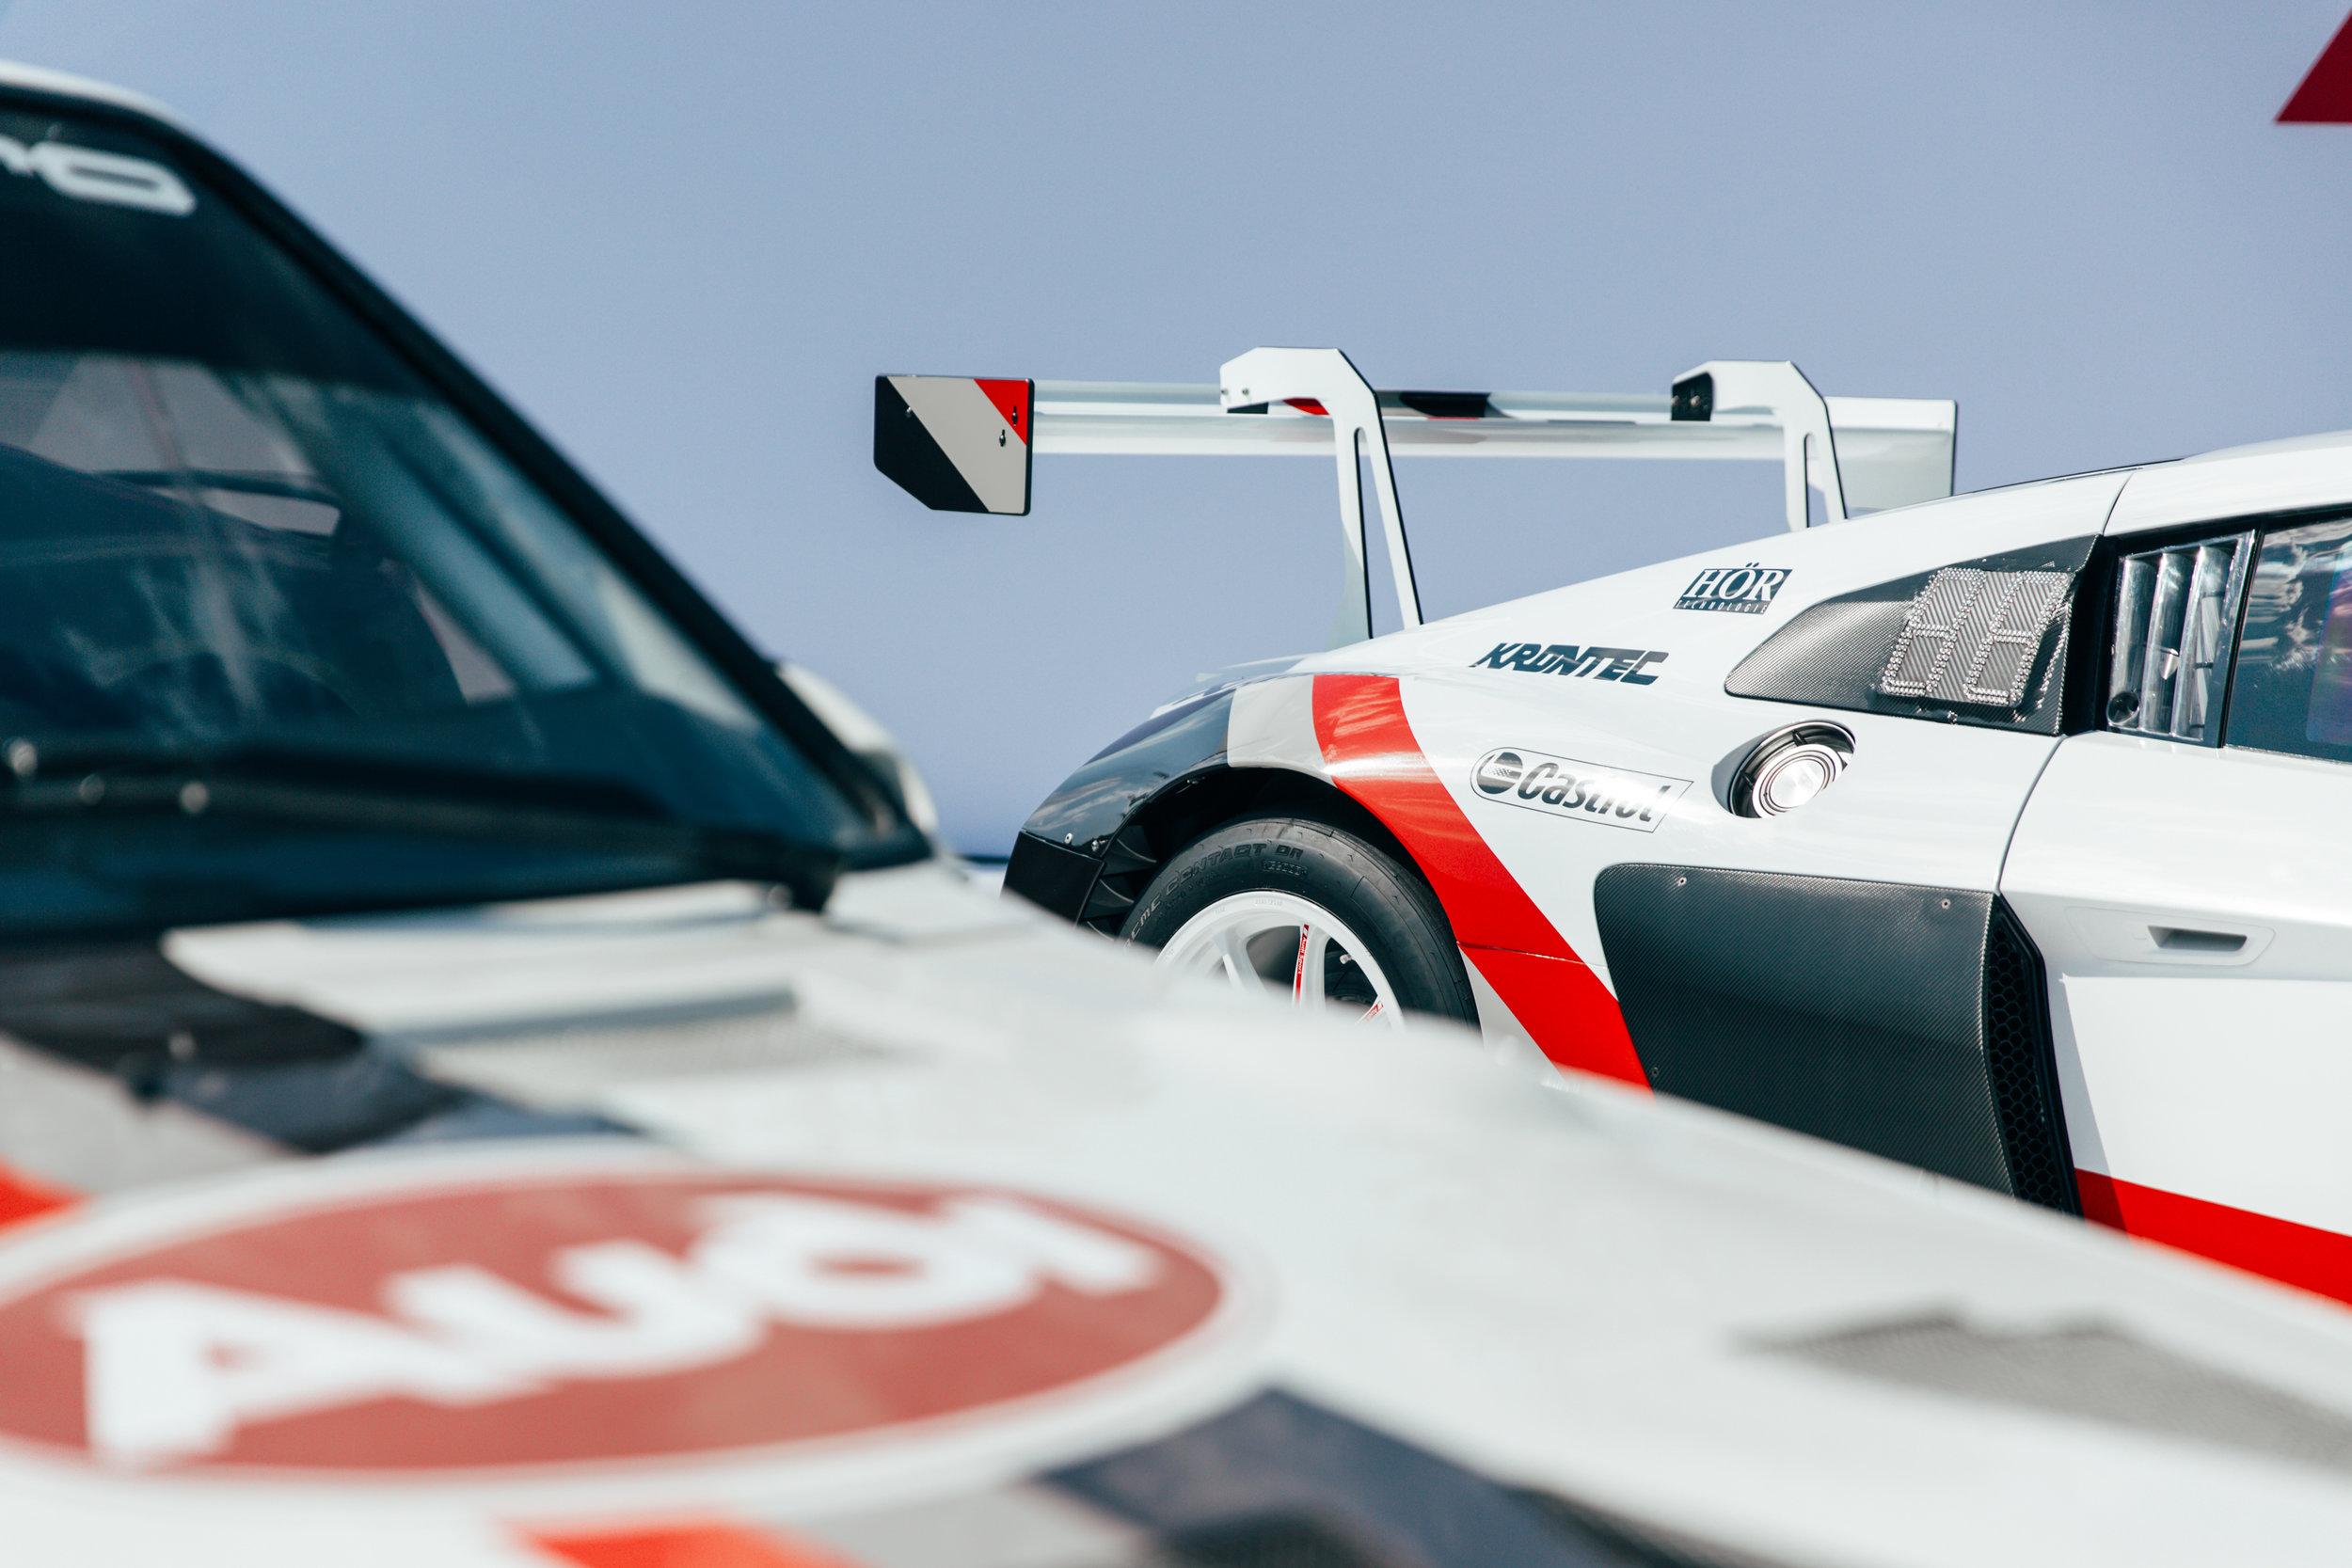 Stay_Driven_Monterey_Car_Week_6-8.jpg